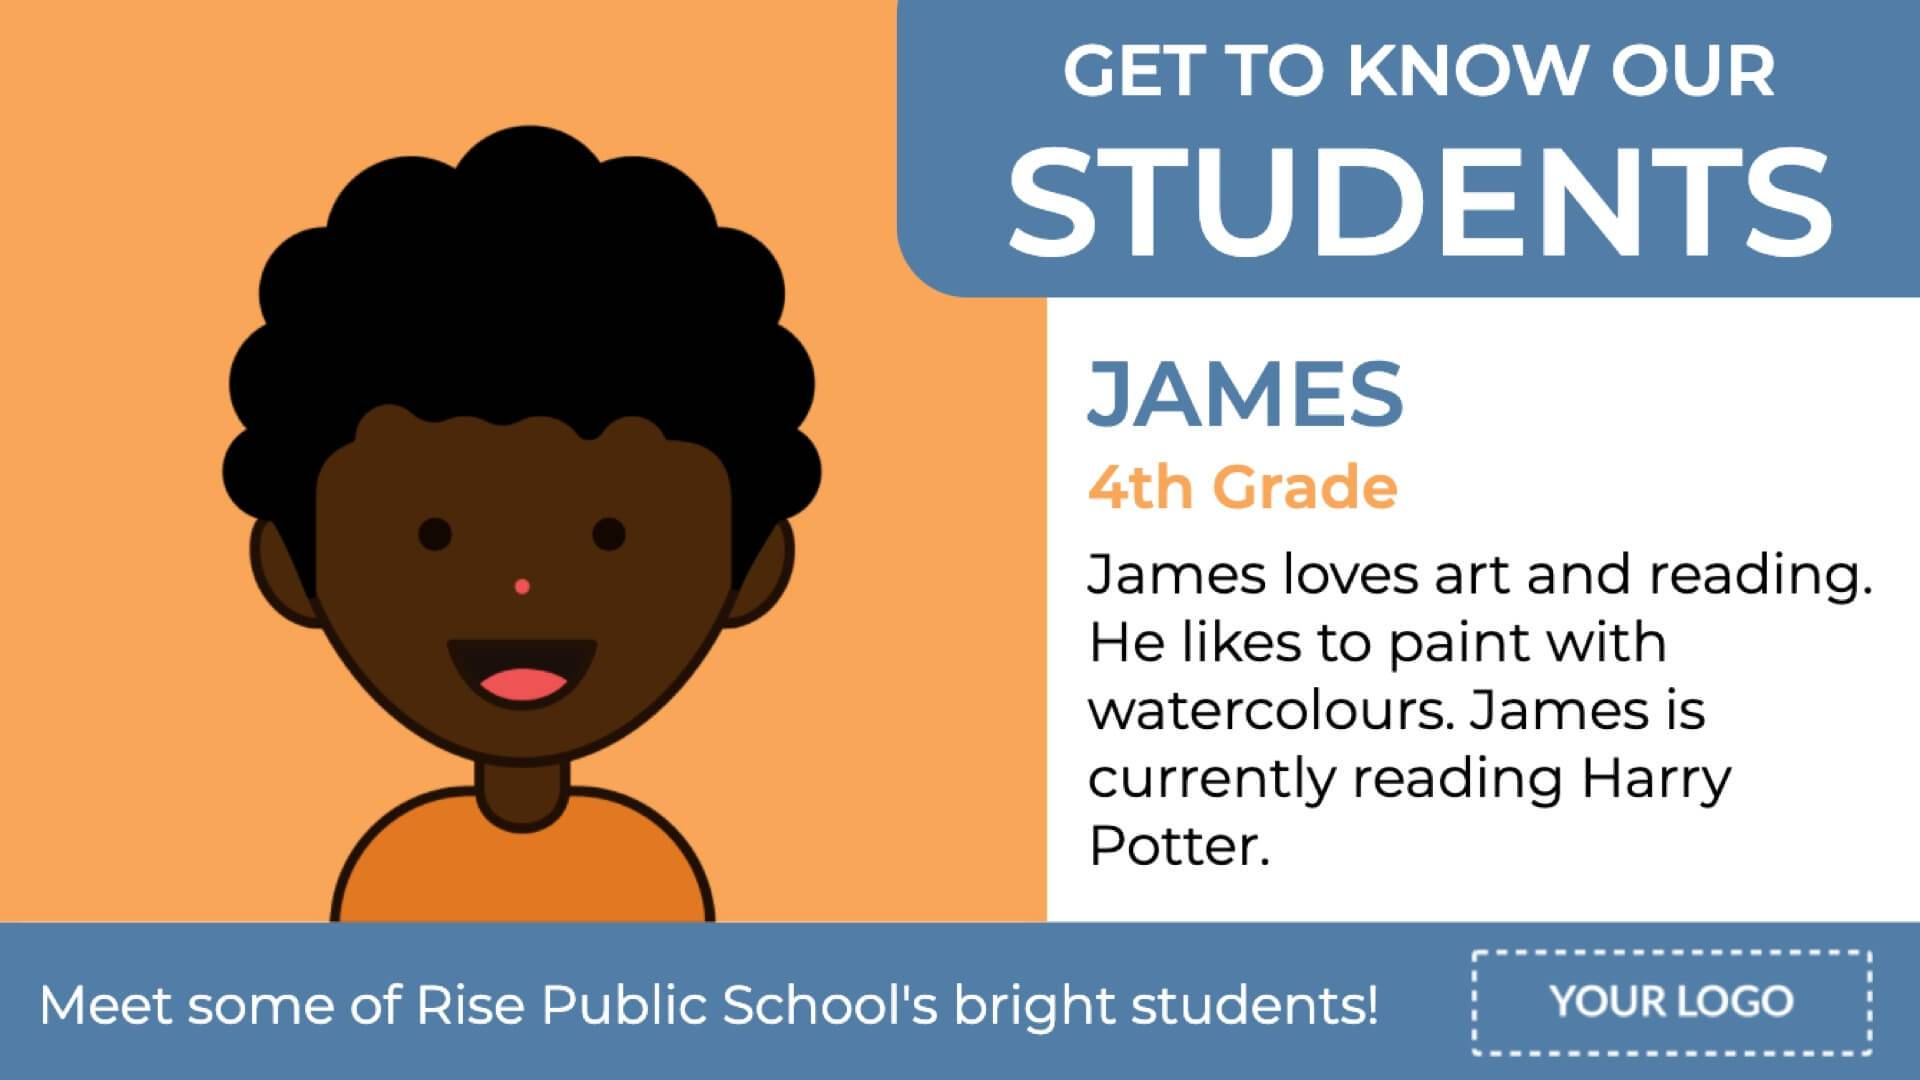 Student Profiles Digital Signage Template